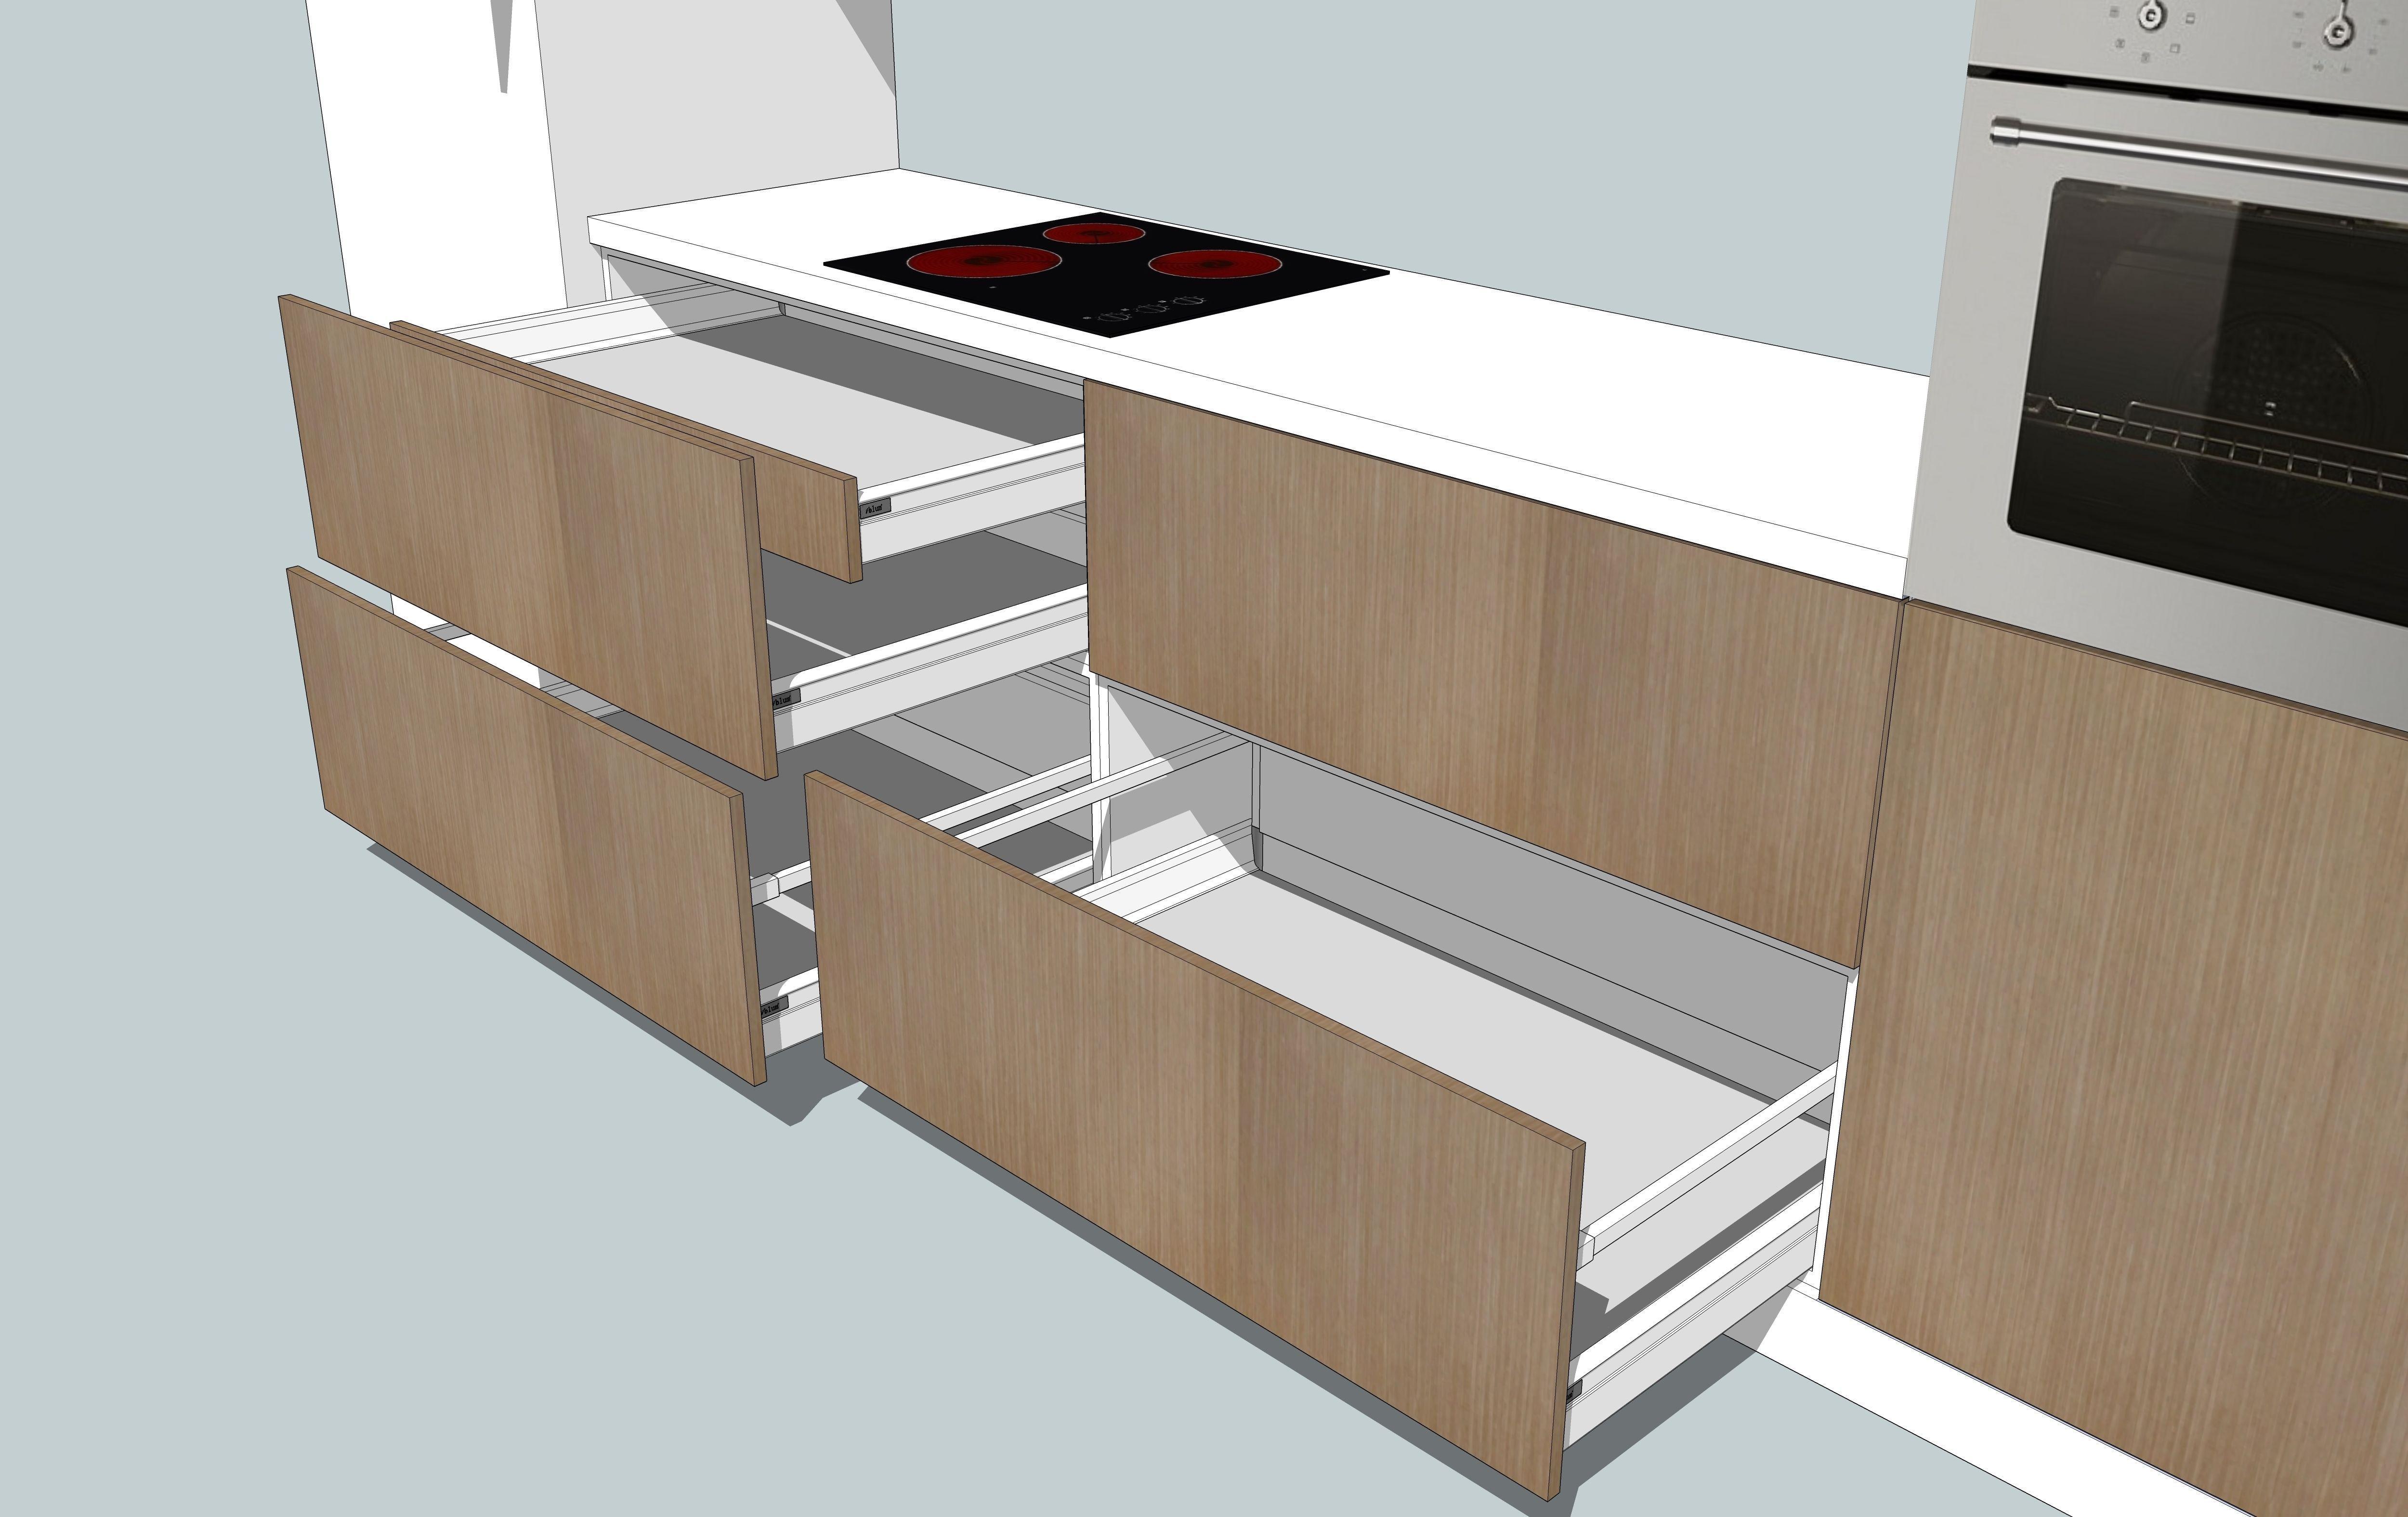 Kitchen 3d Model kitchen 3d model architectural   cgtrader